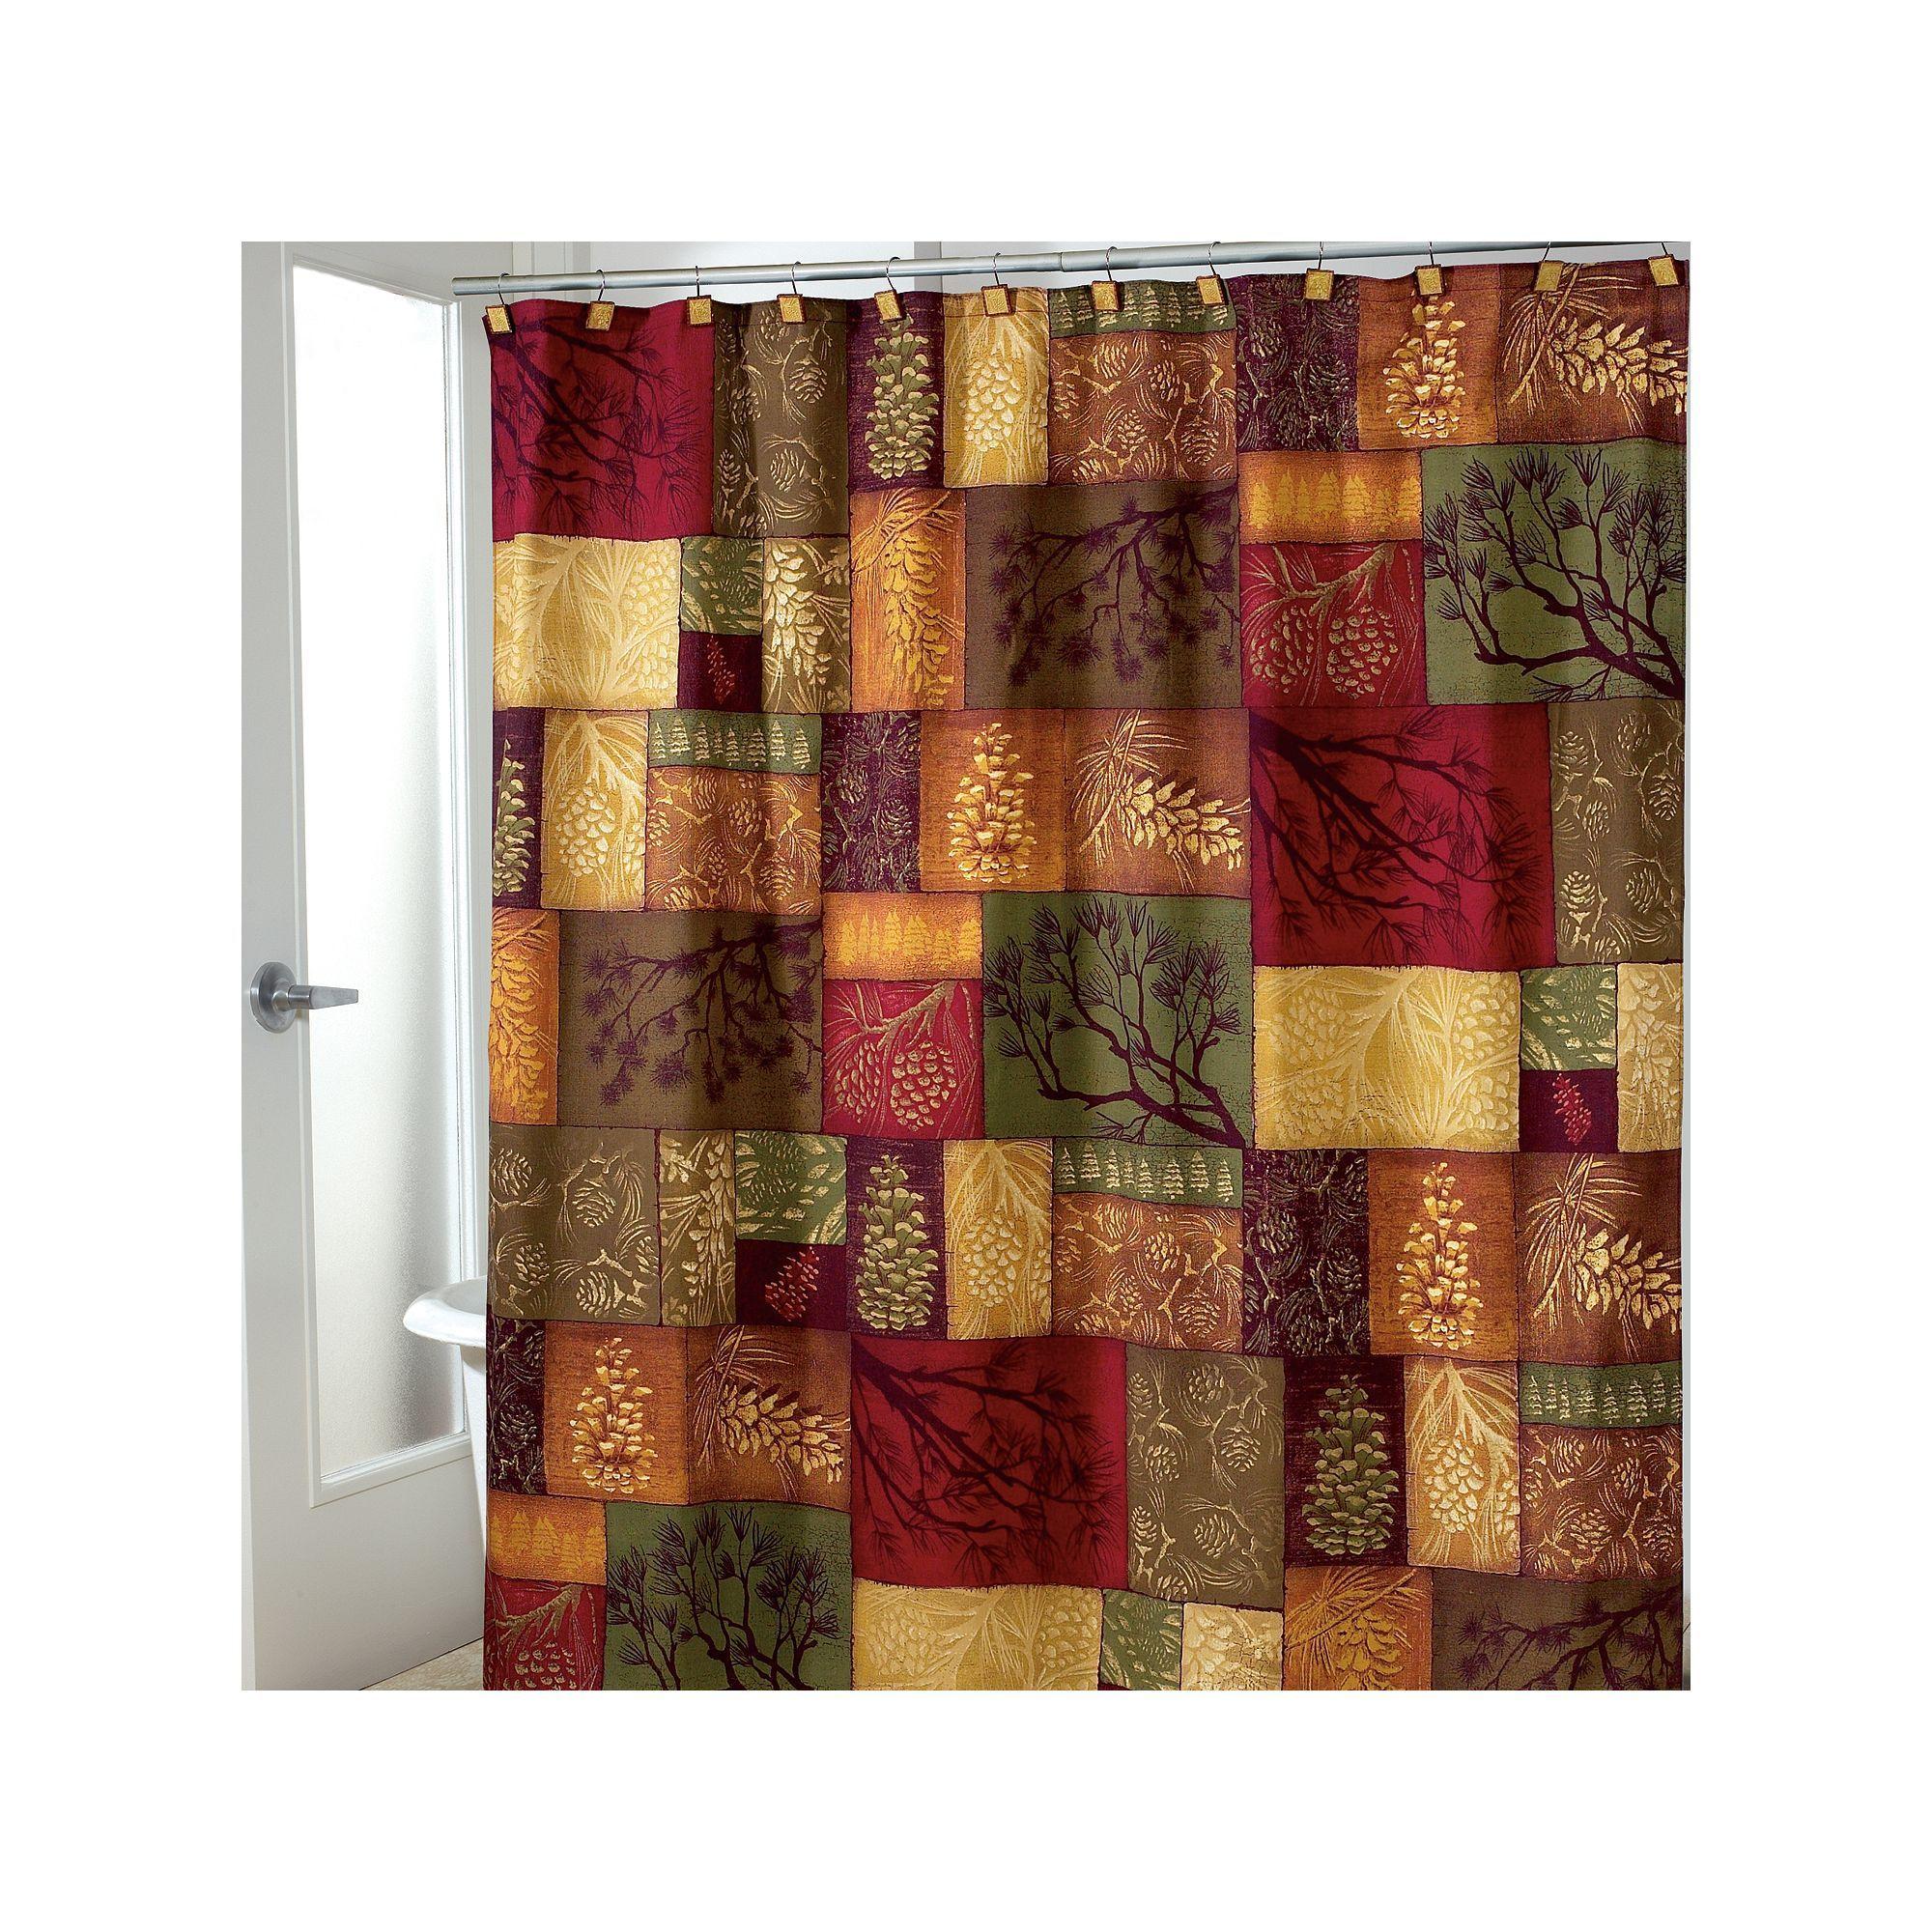 Kohls Christmas Shower Curtain.Avanti Christmas Adirondack Pine Fabric Shower Curtain In